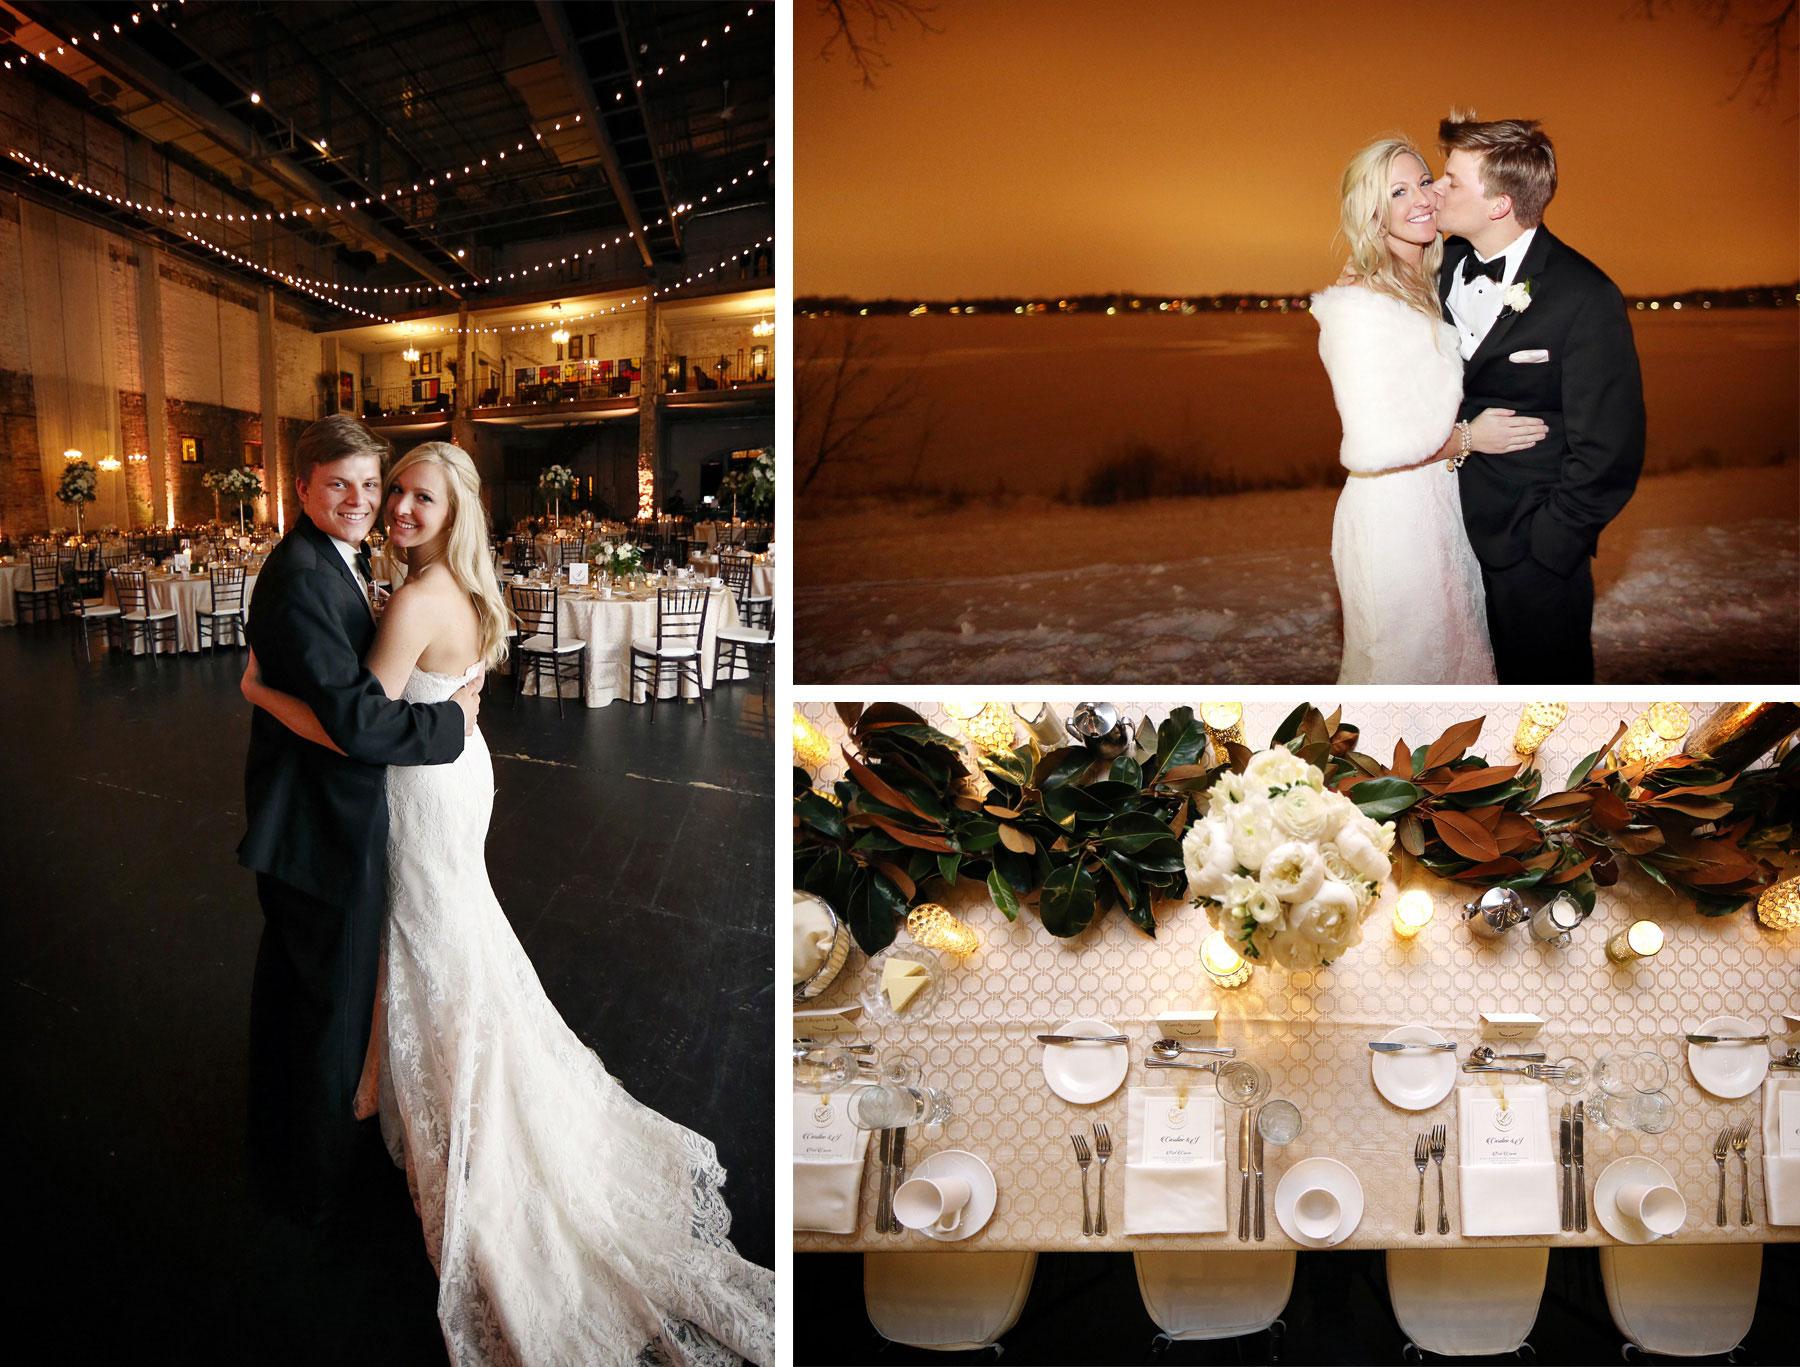 16-Minneapolis-Minnesota-Wedding-Photography-by-Vick-Photography-Aria-Winter-Reception-Caroline-and-J.jpg